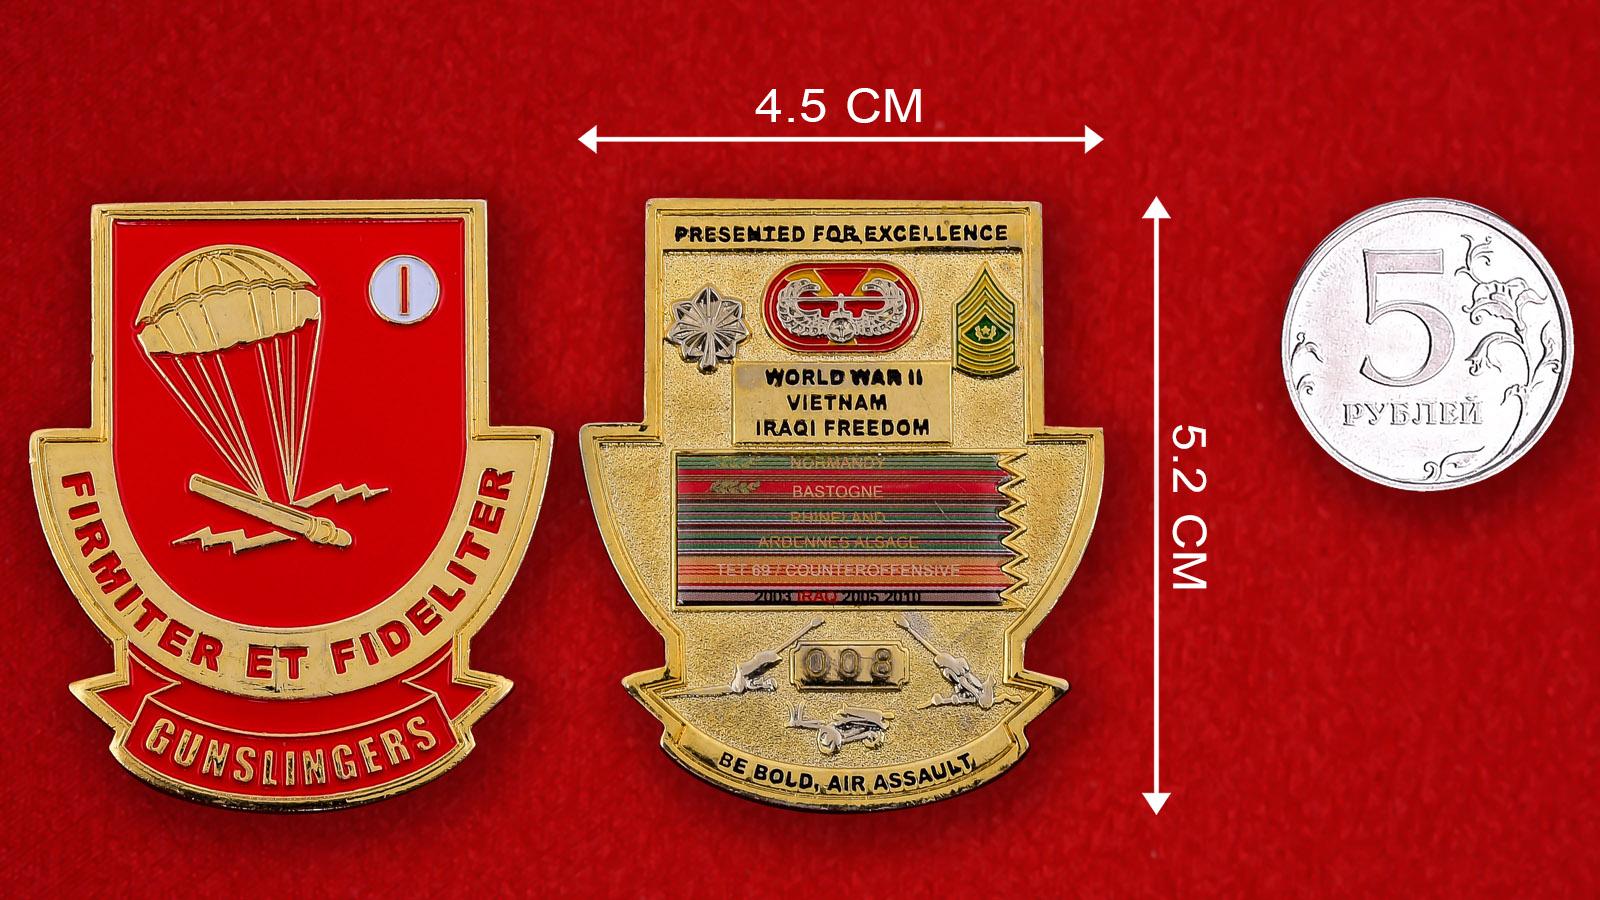 Челлендж коин 377-го полка Полевой артиллерии армии США